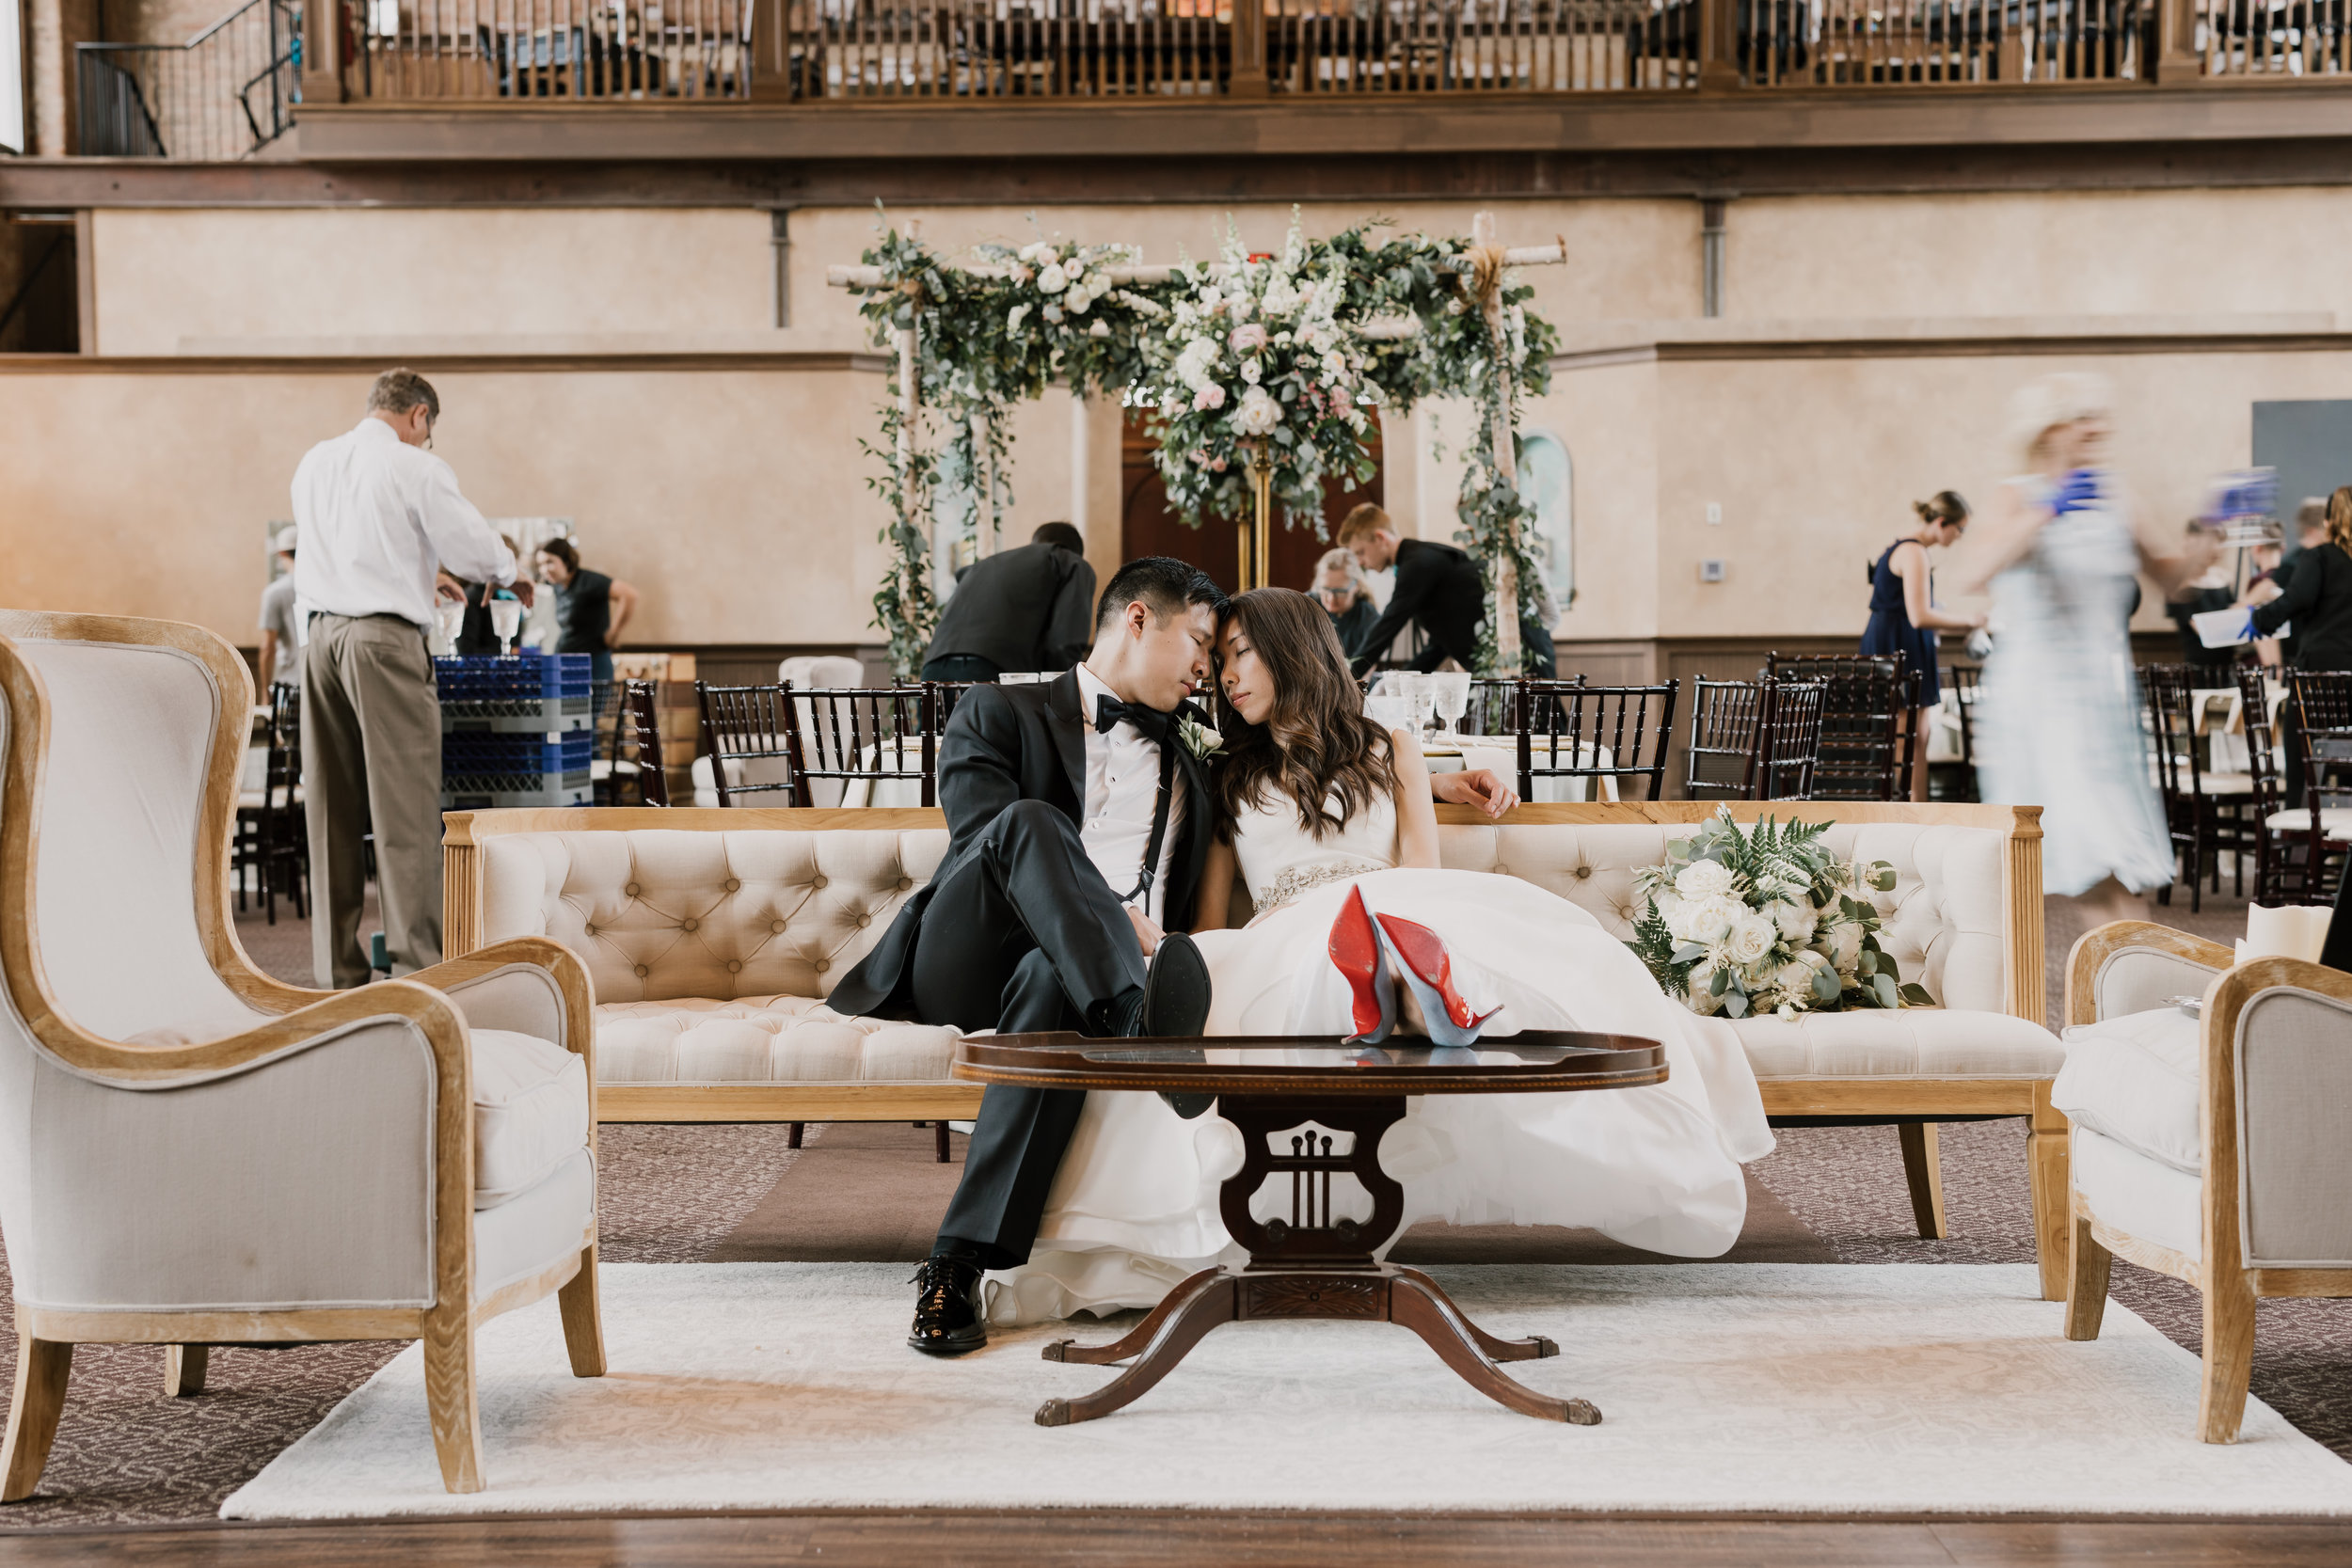 monastery event center wedding, Cincinnati wedding planner